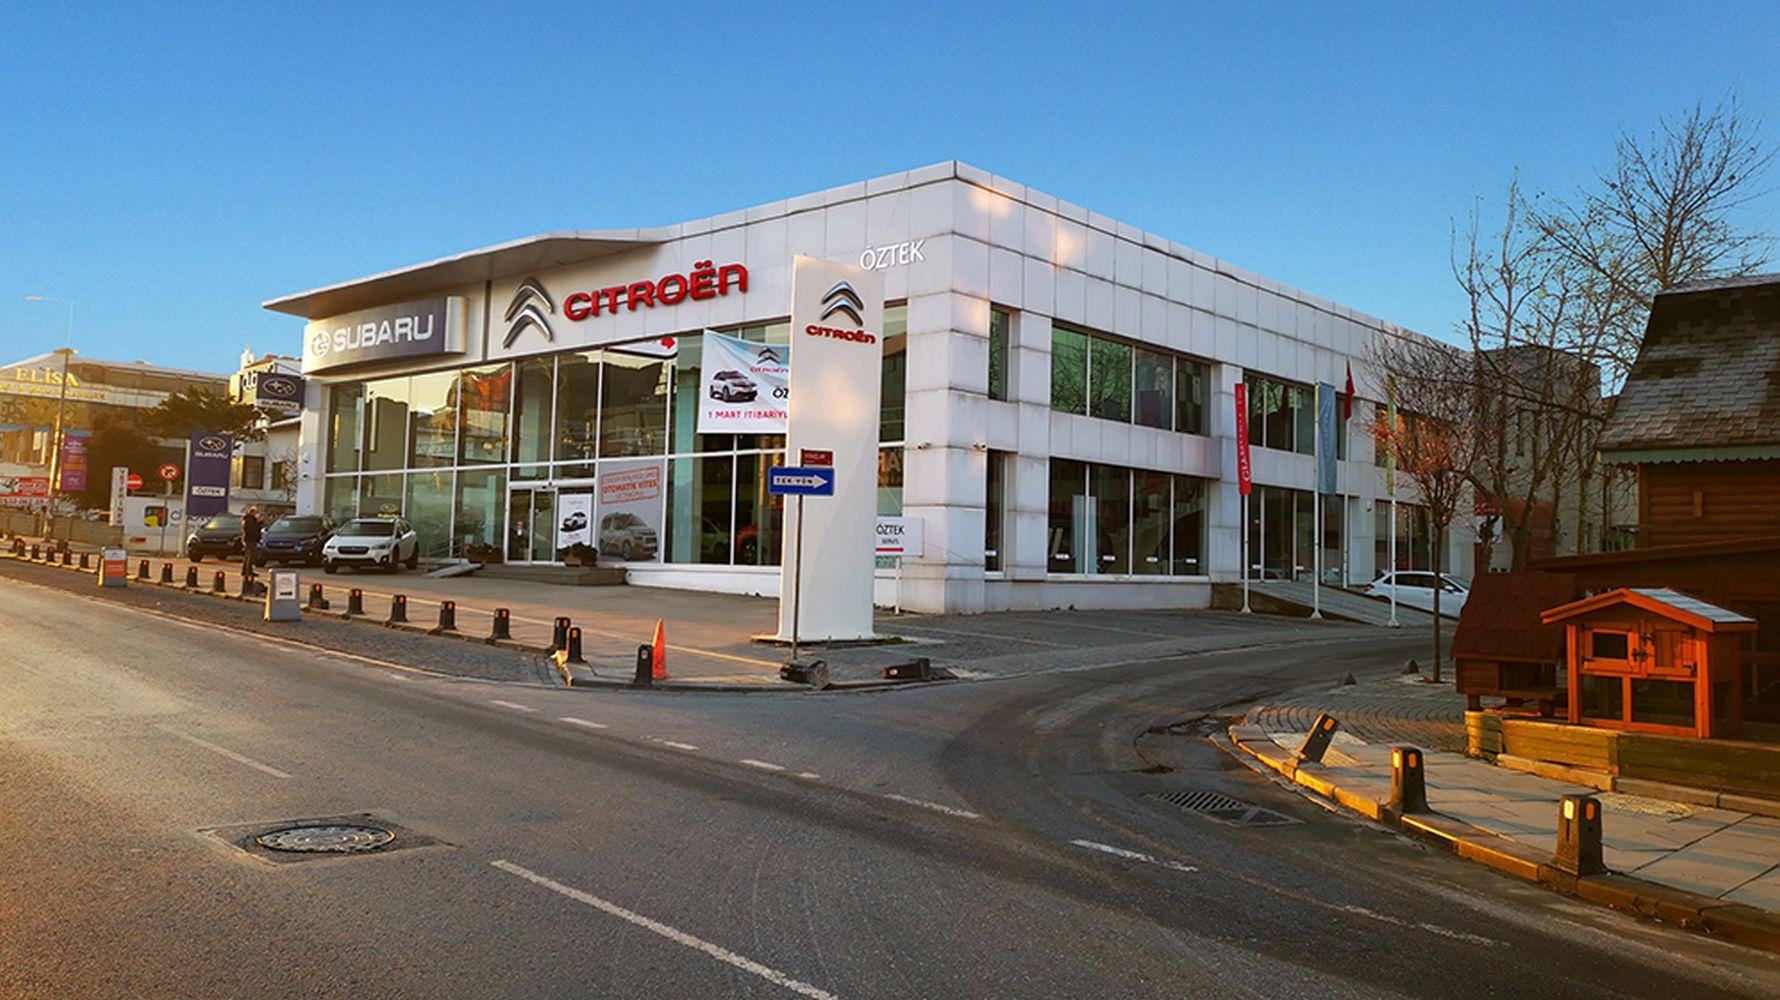 cekmekoye citroen and subaru investment from oztek automotive